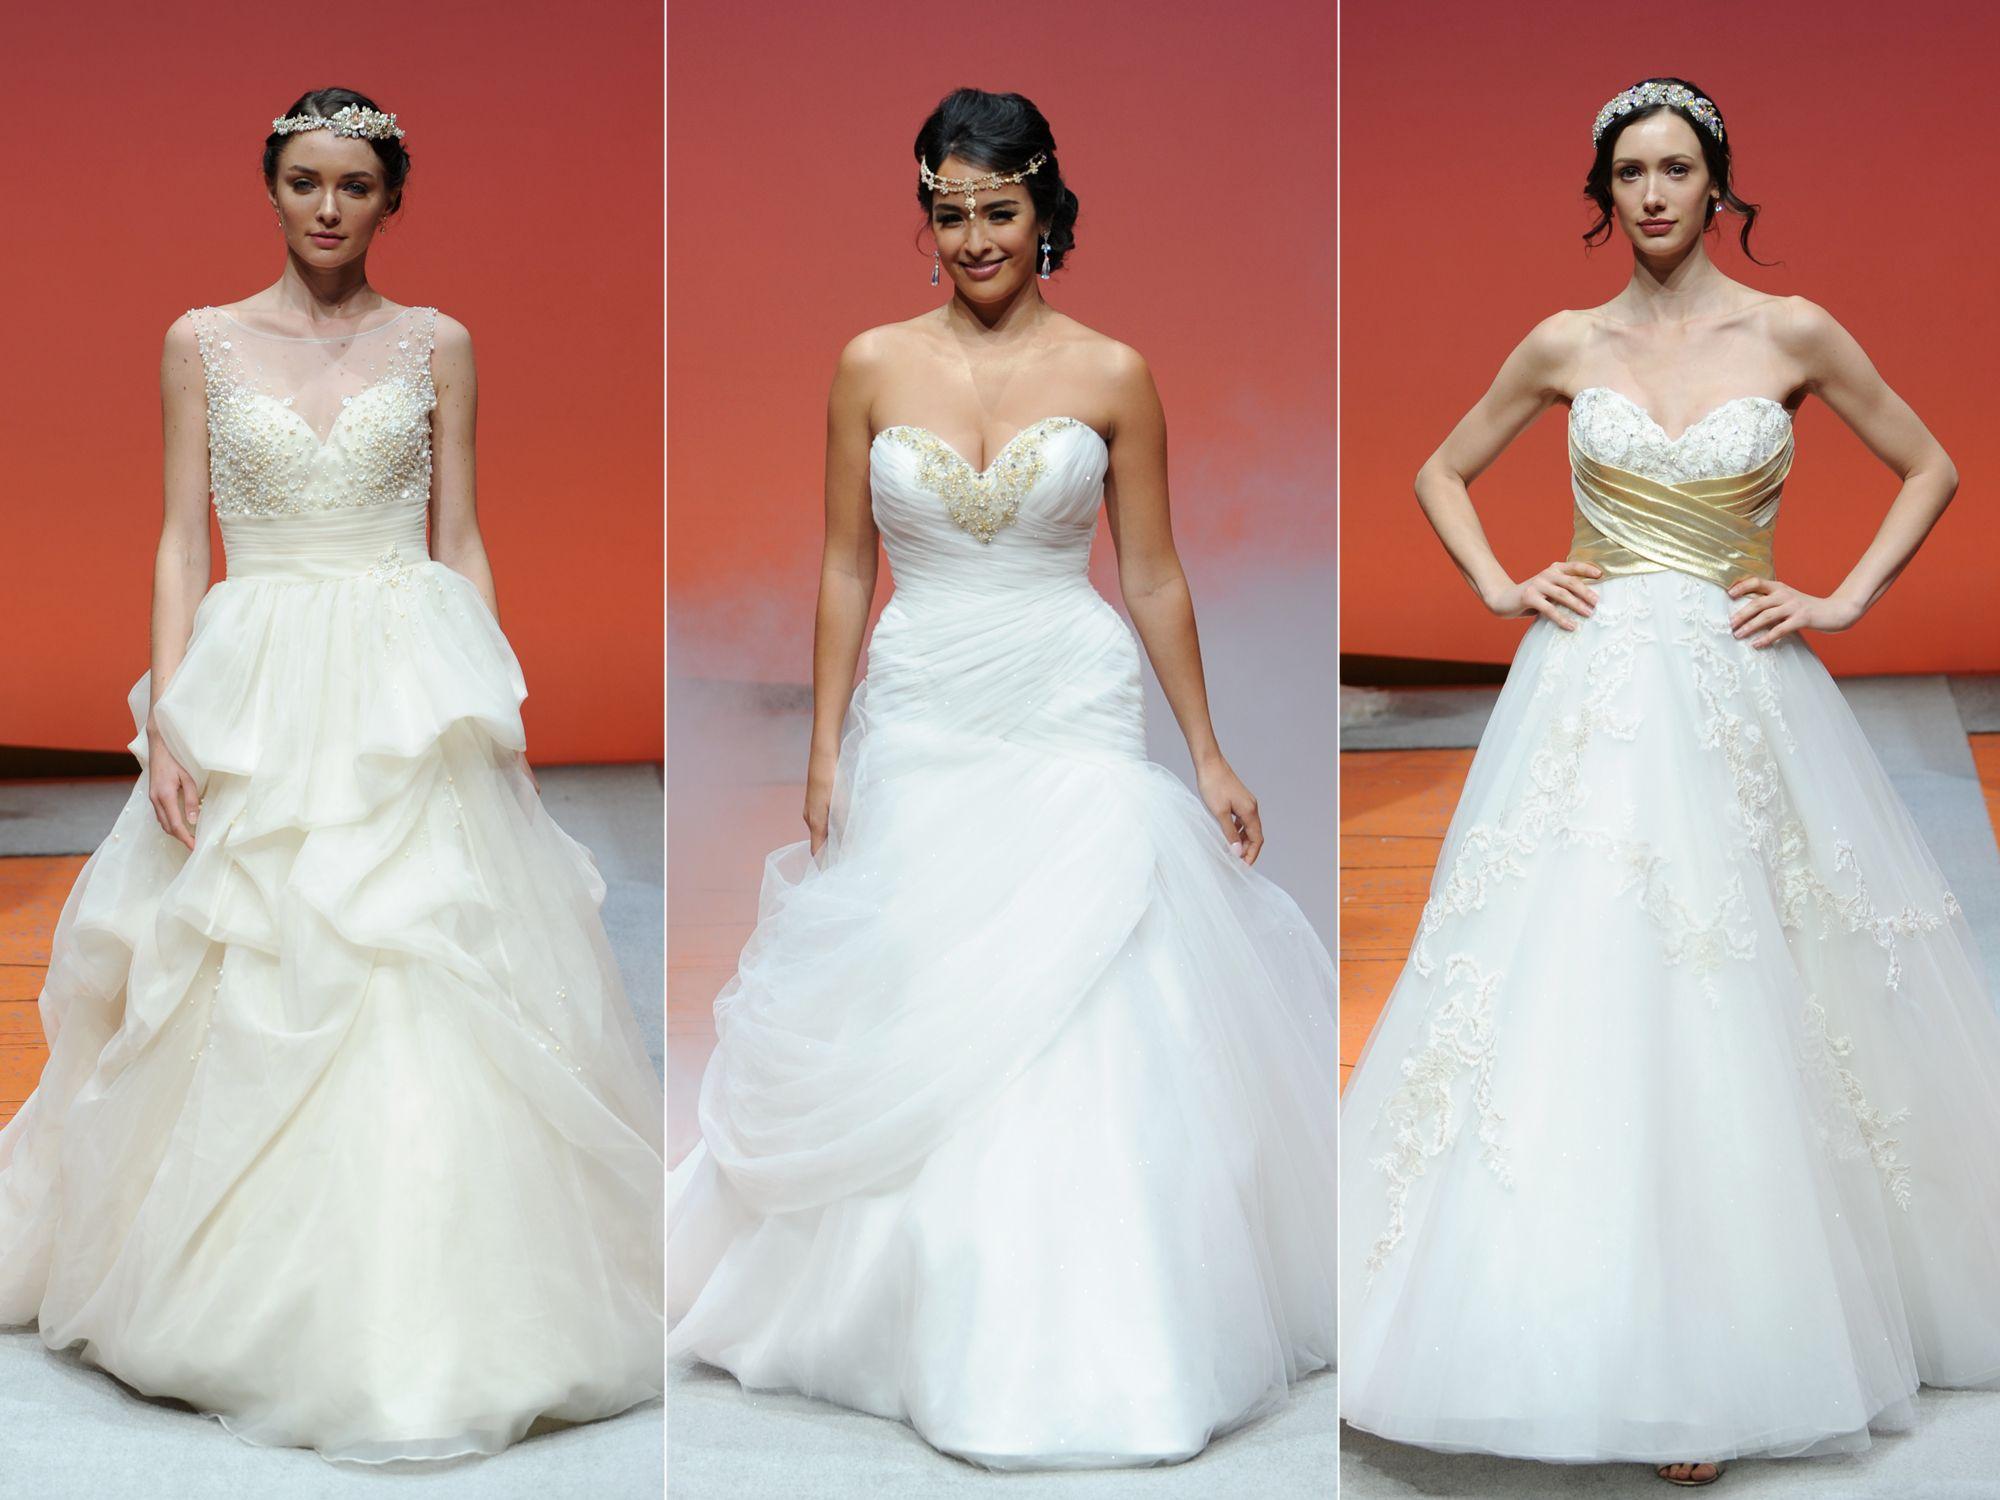 See Disney Fairy Tale Weddings By Alfred Angelo's Wedding